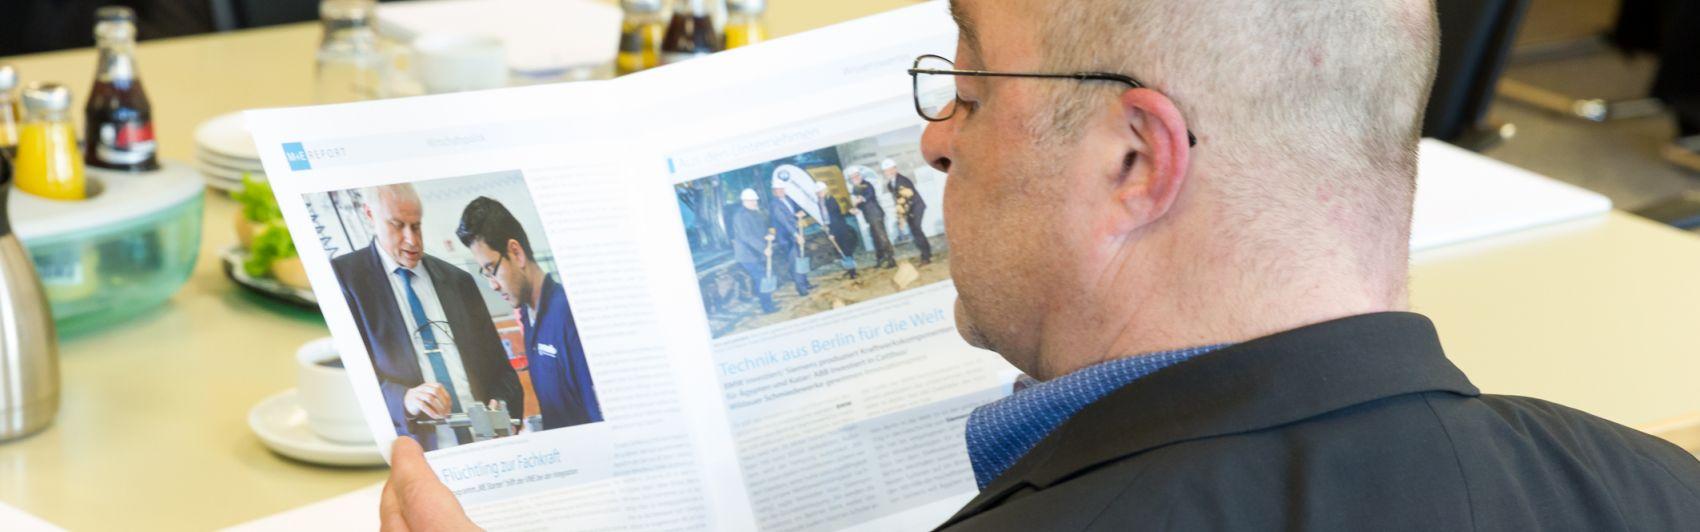 Ein Redakteur liest den aktuellen ME-Report 1/2016